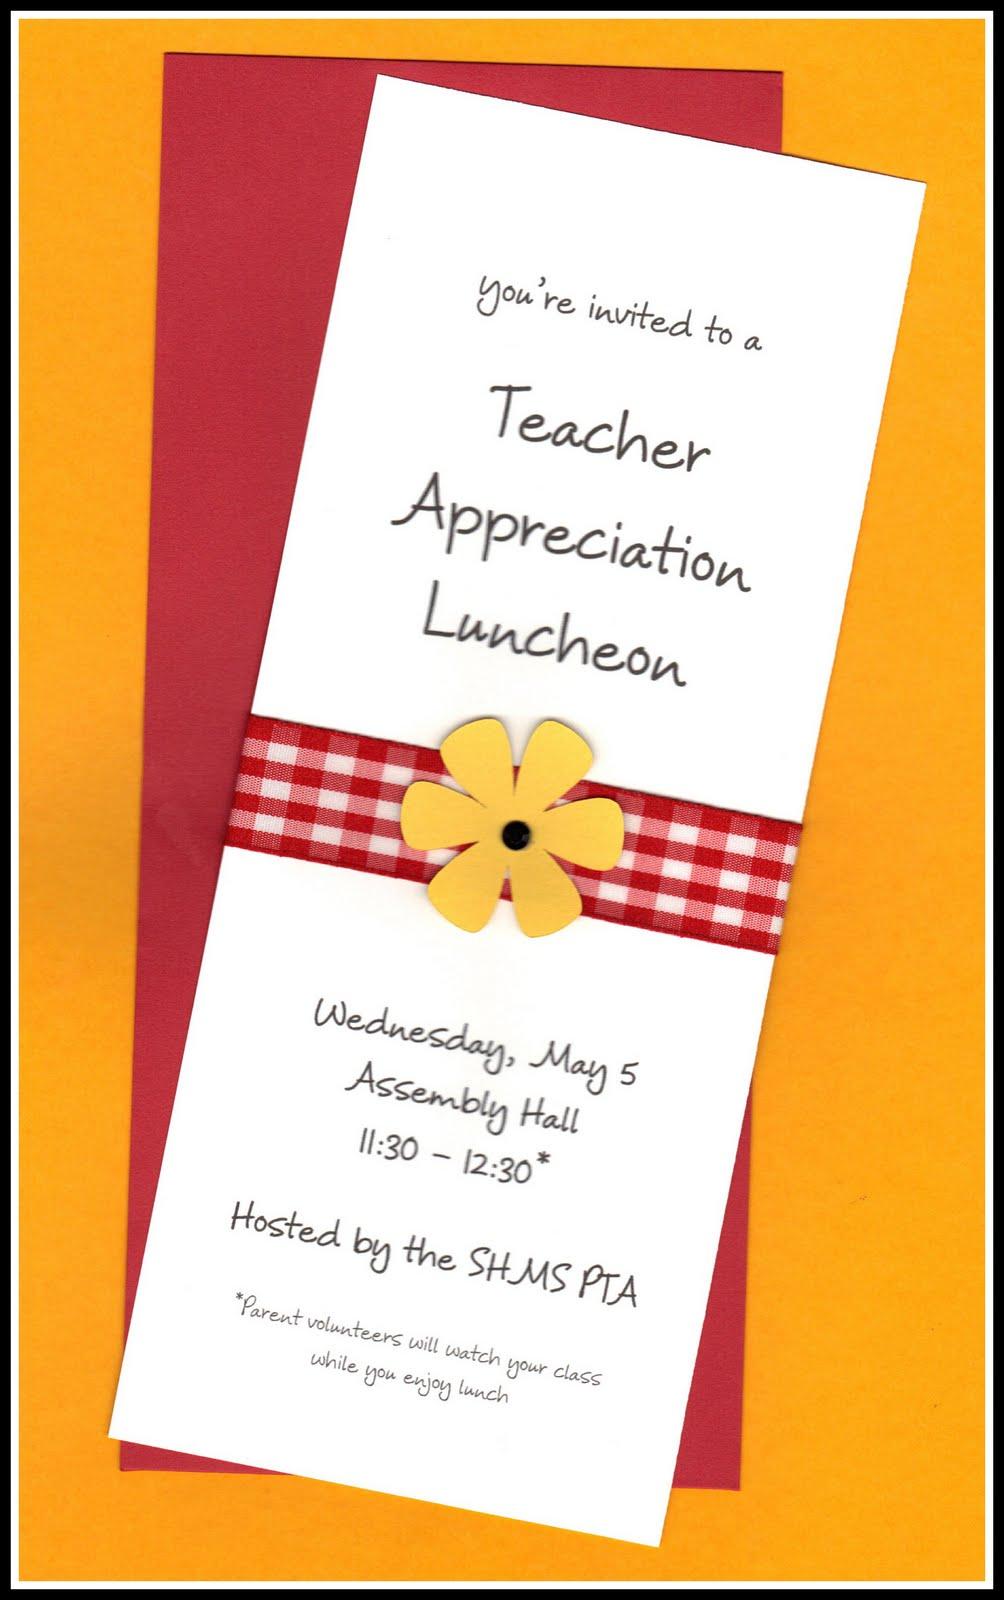 Employee Appreciation Lunch Invitation Wording